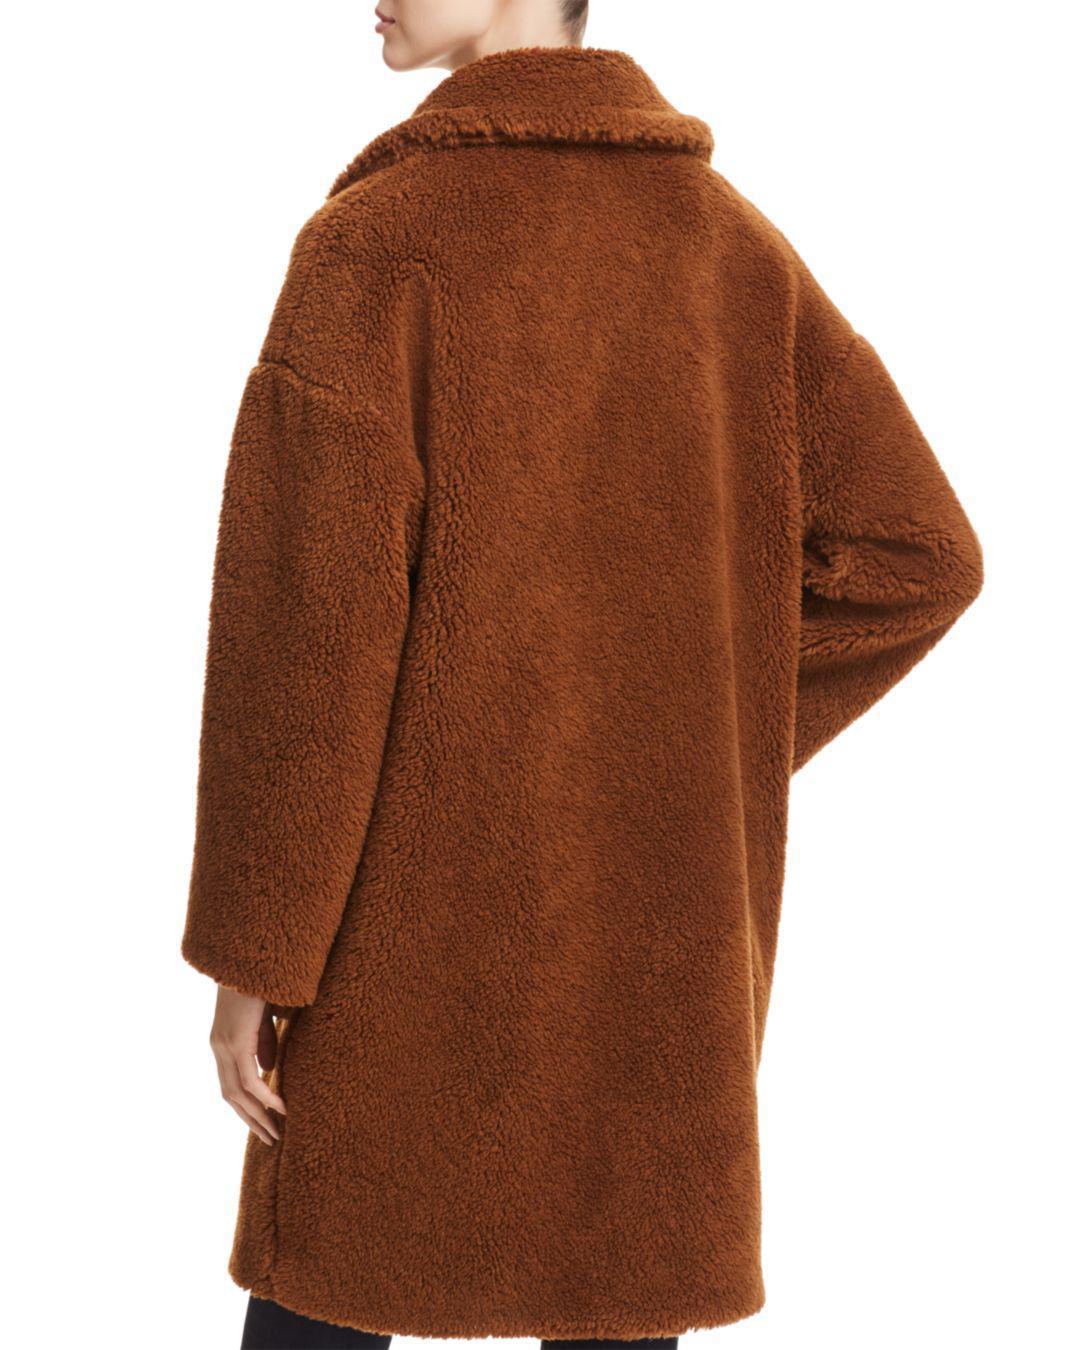 2969314d4 Lyst - Weekend by Maxmara Reale Faux-fur Teddy Bear Coat in Brown